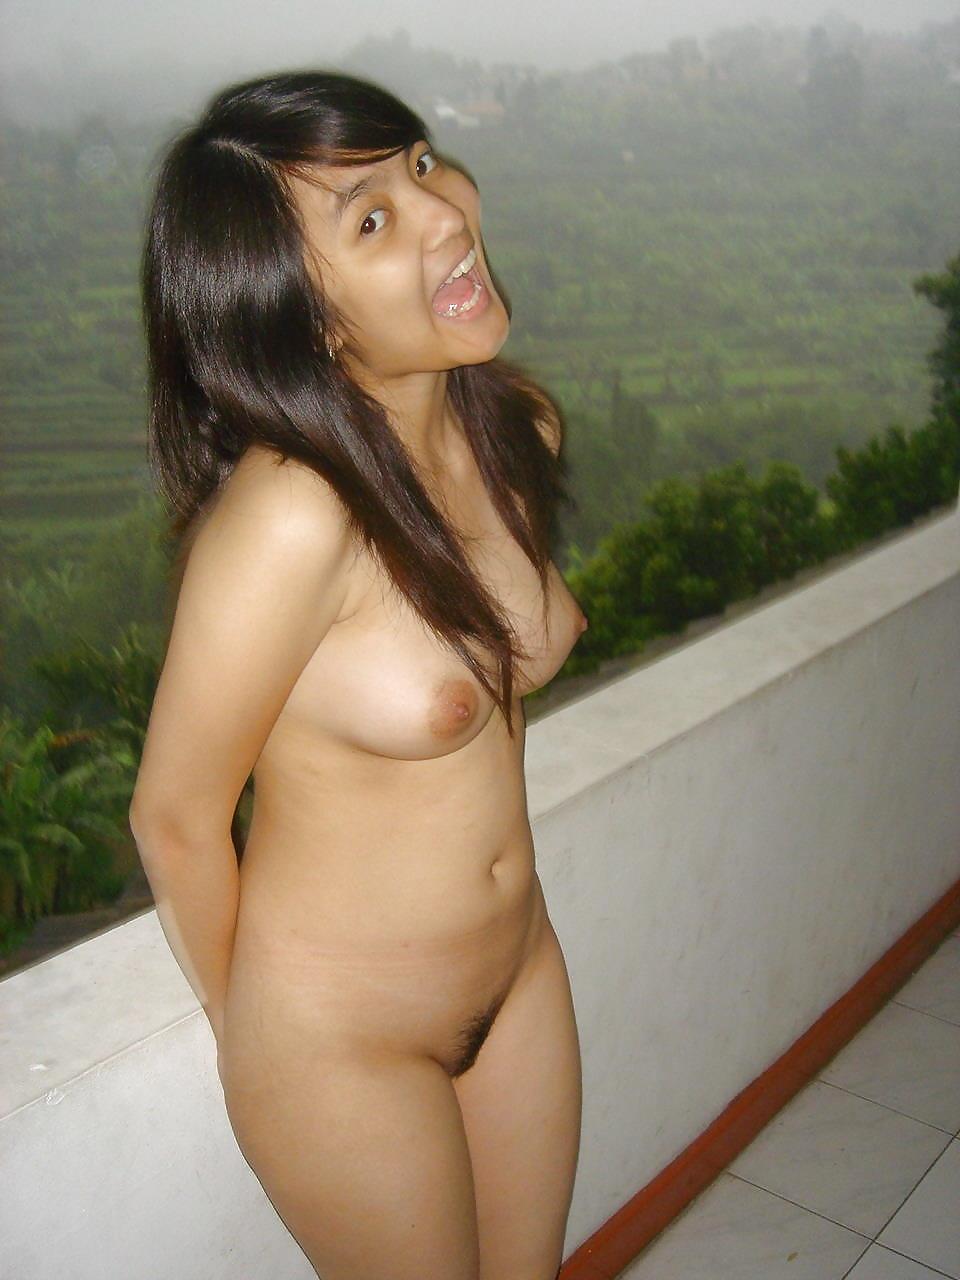 Nepali Sexy Girls Hot Pussy Photo Domination Porn Pics